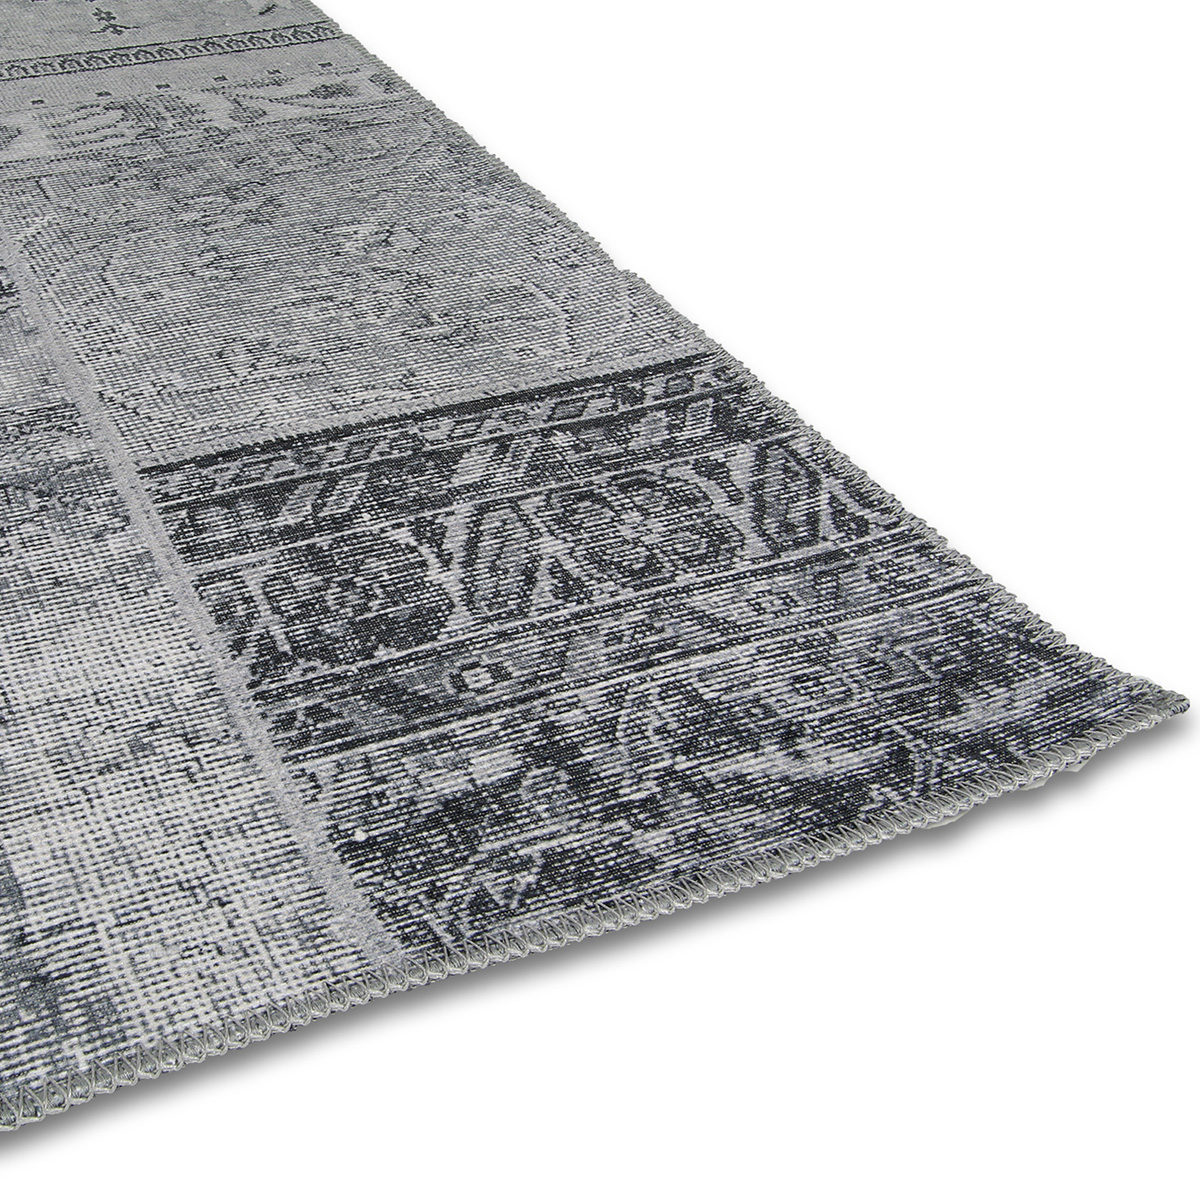 Vloerkleed Brinker Bukan Light Grey | 190 x 290 cm